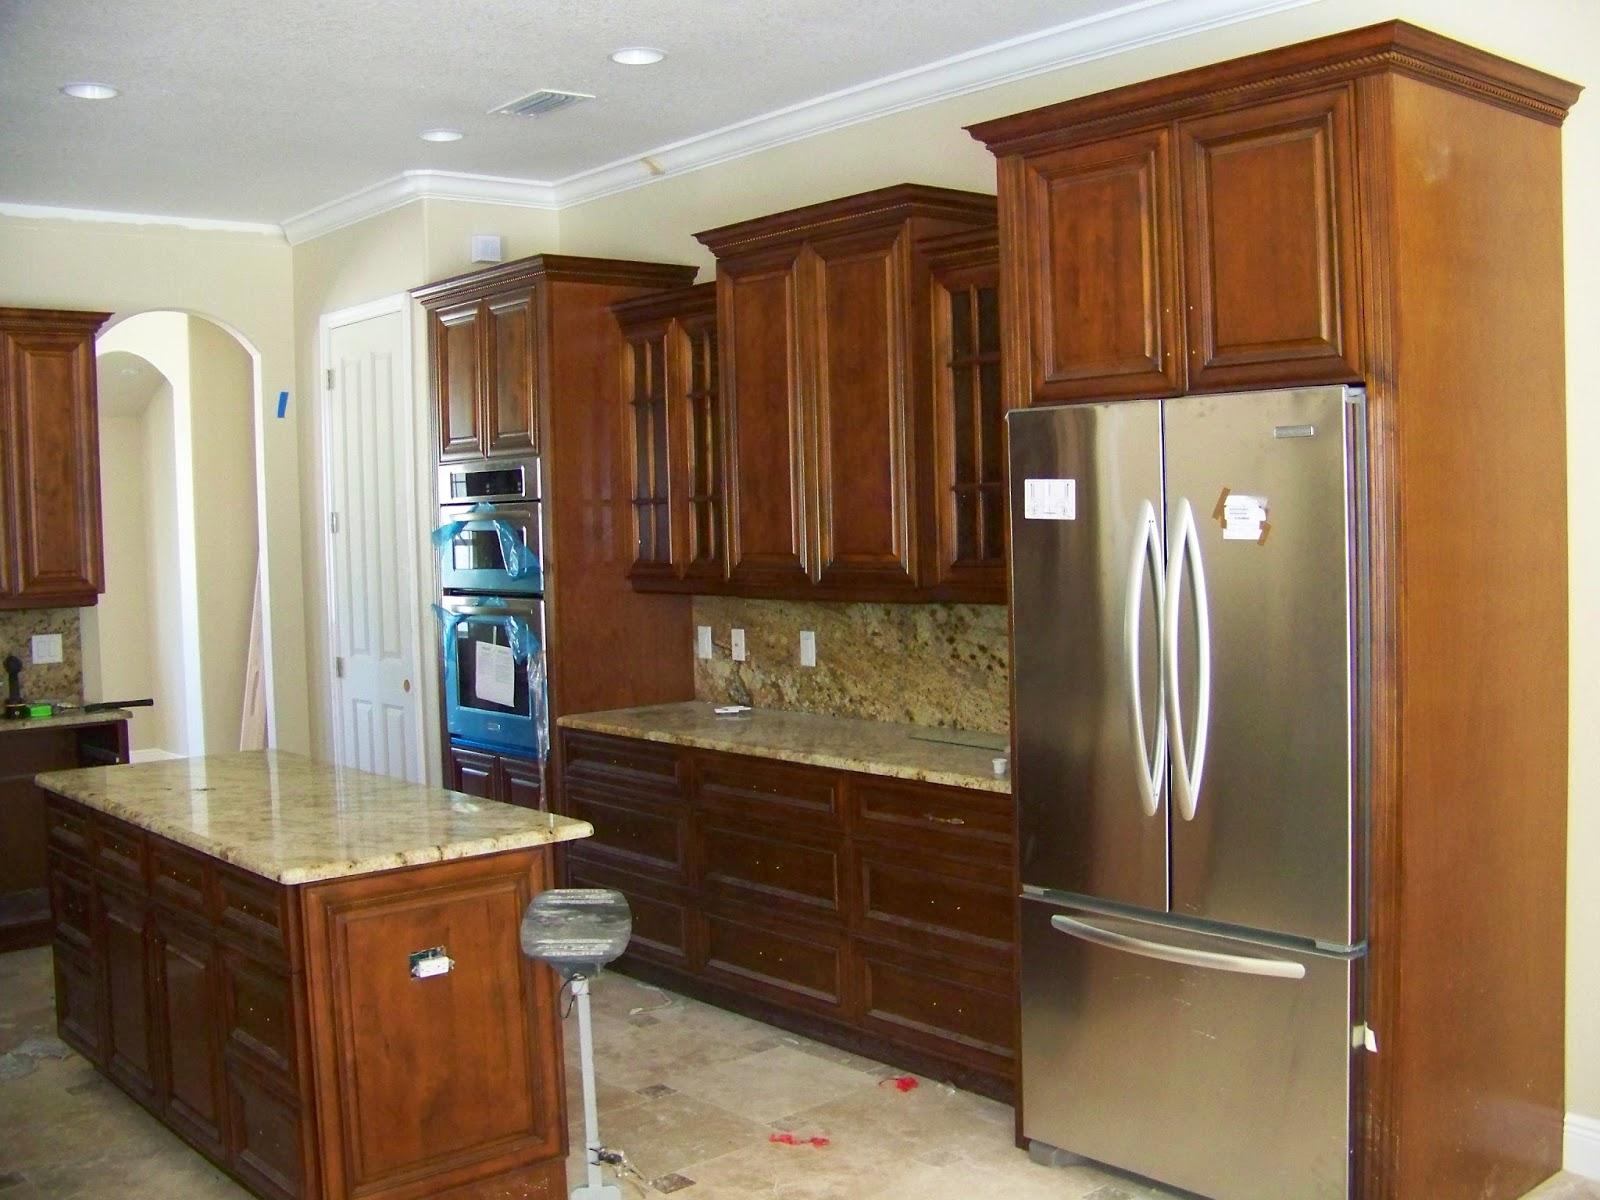 Kitchen Cabinets & Granite: Wood Cabinets vs Particle board